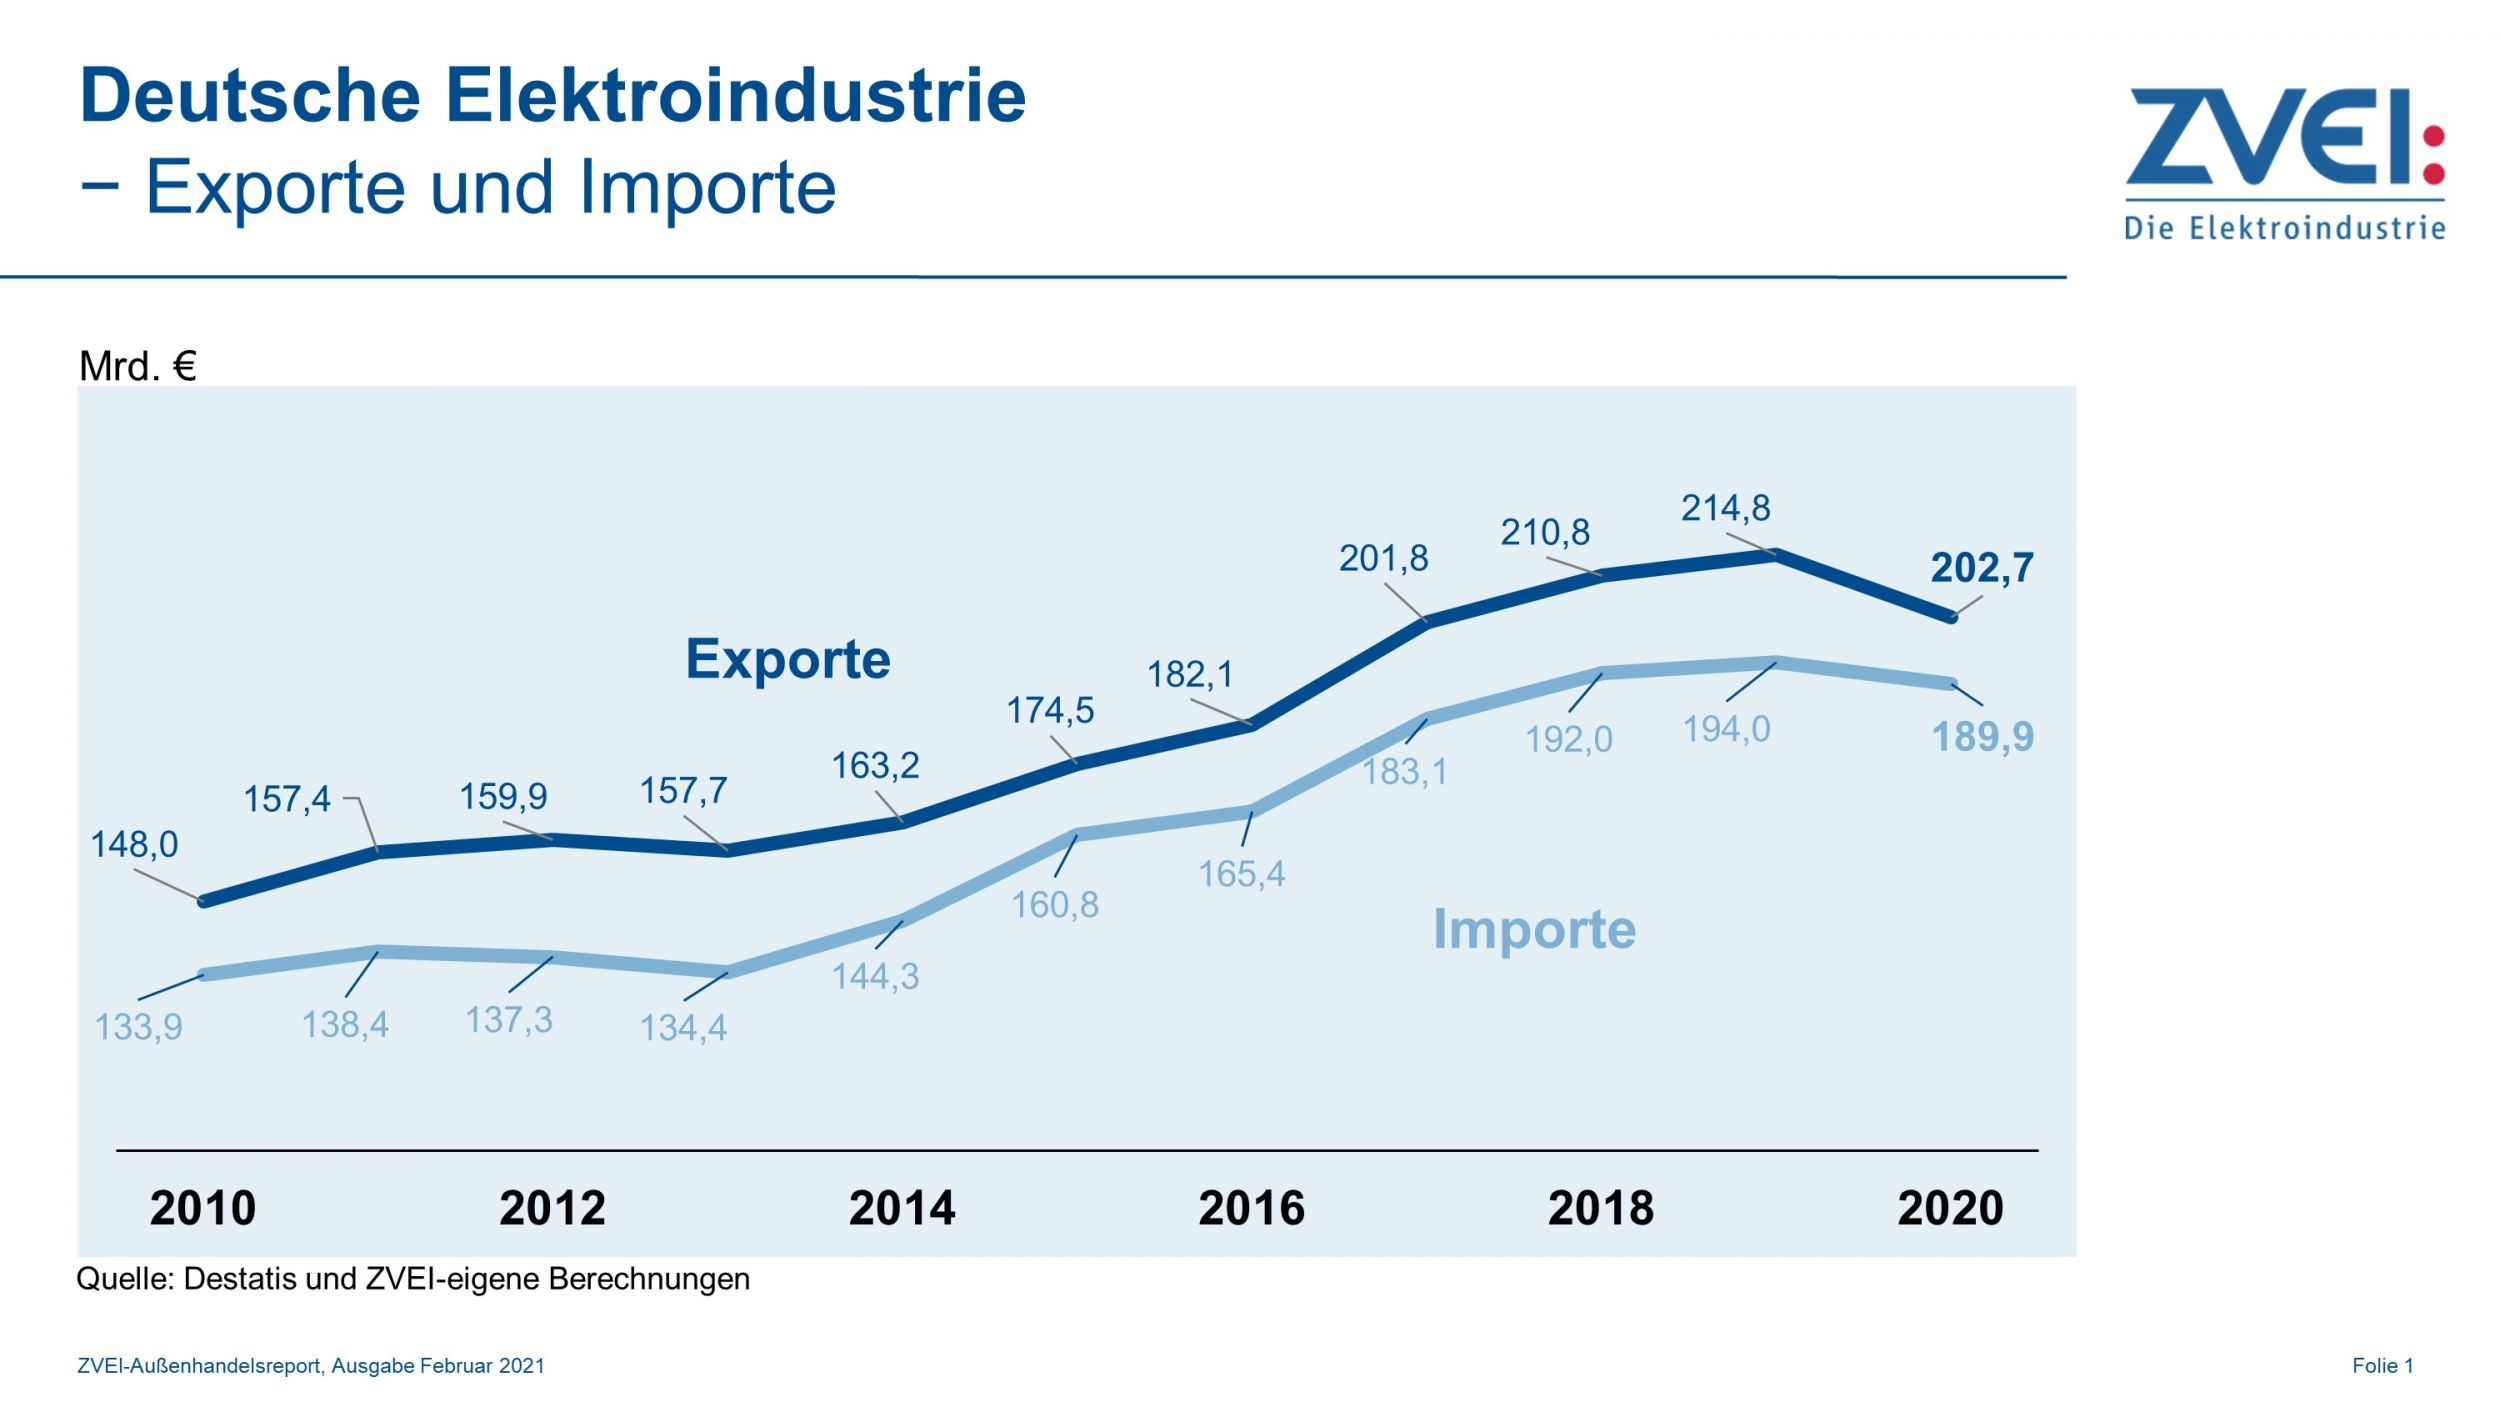 Elektroexporte: Erholung zum Jahresende 2020